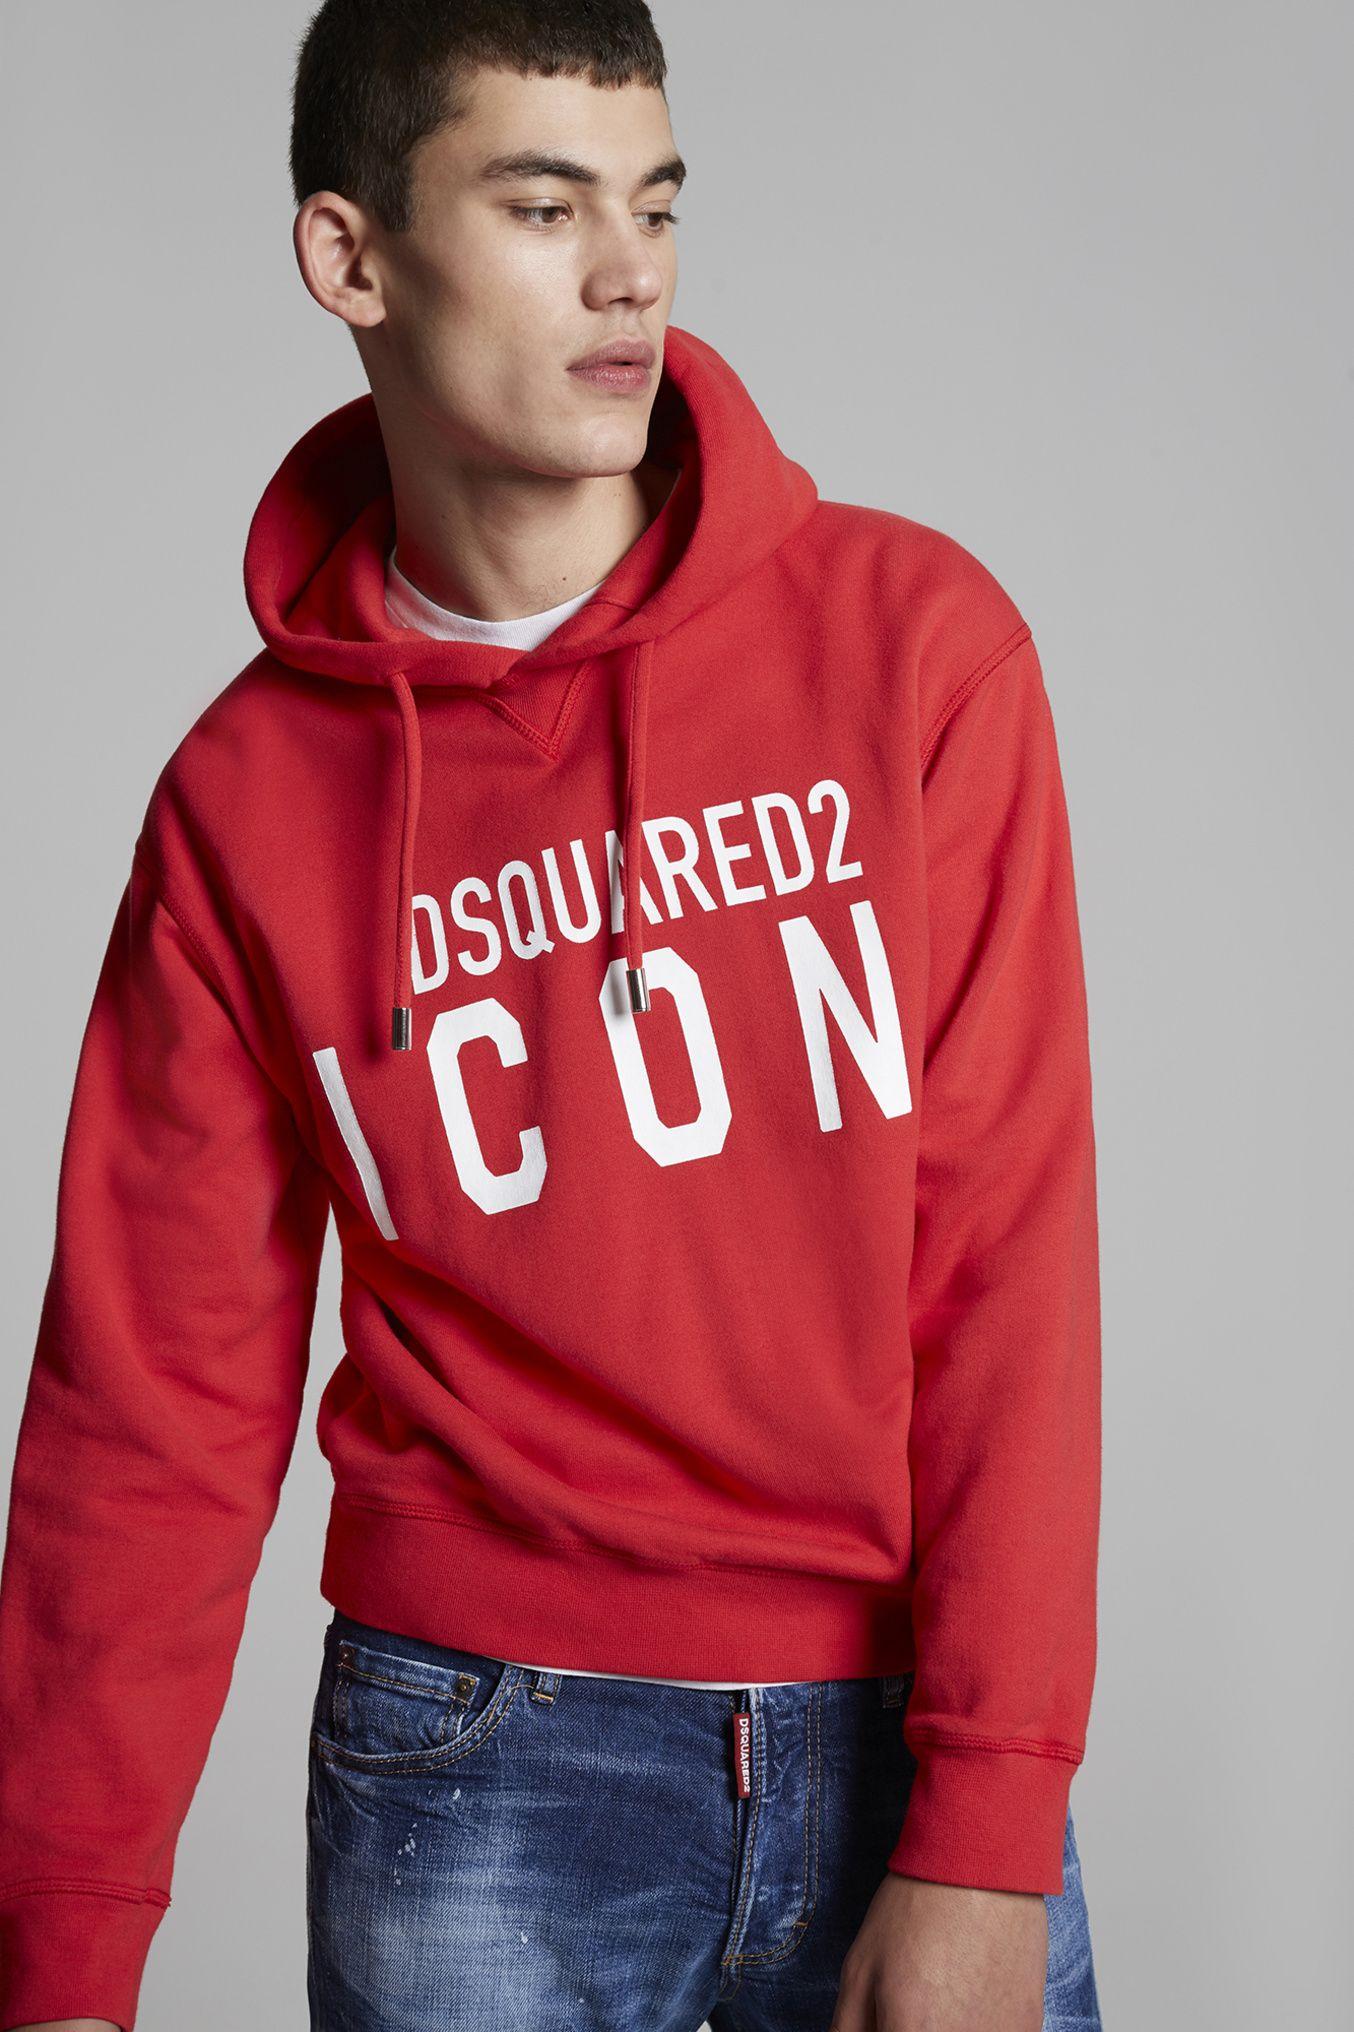 Dsquared2 Icon Hooded Sweatshirt Red Sweatshirts For Men Official Store Hooded Sweatshirts Sweatshirts Hoodies Shop [ 2032 x 1354 Pixel ]